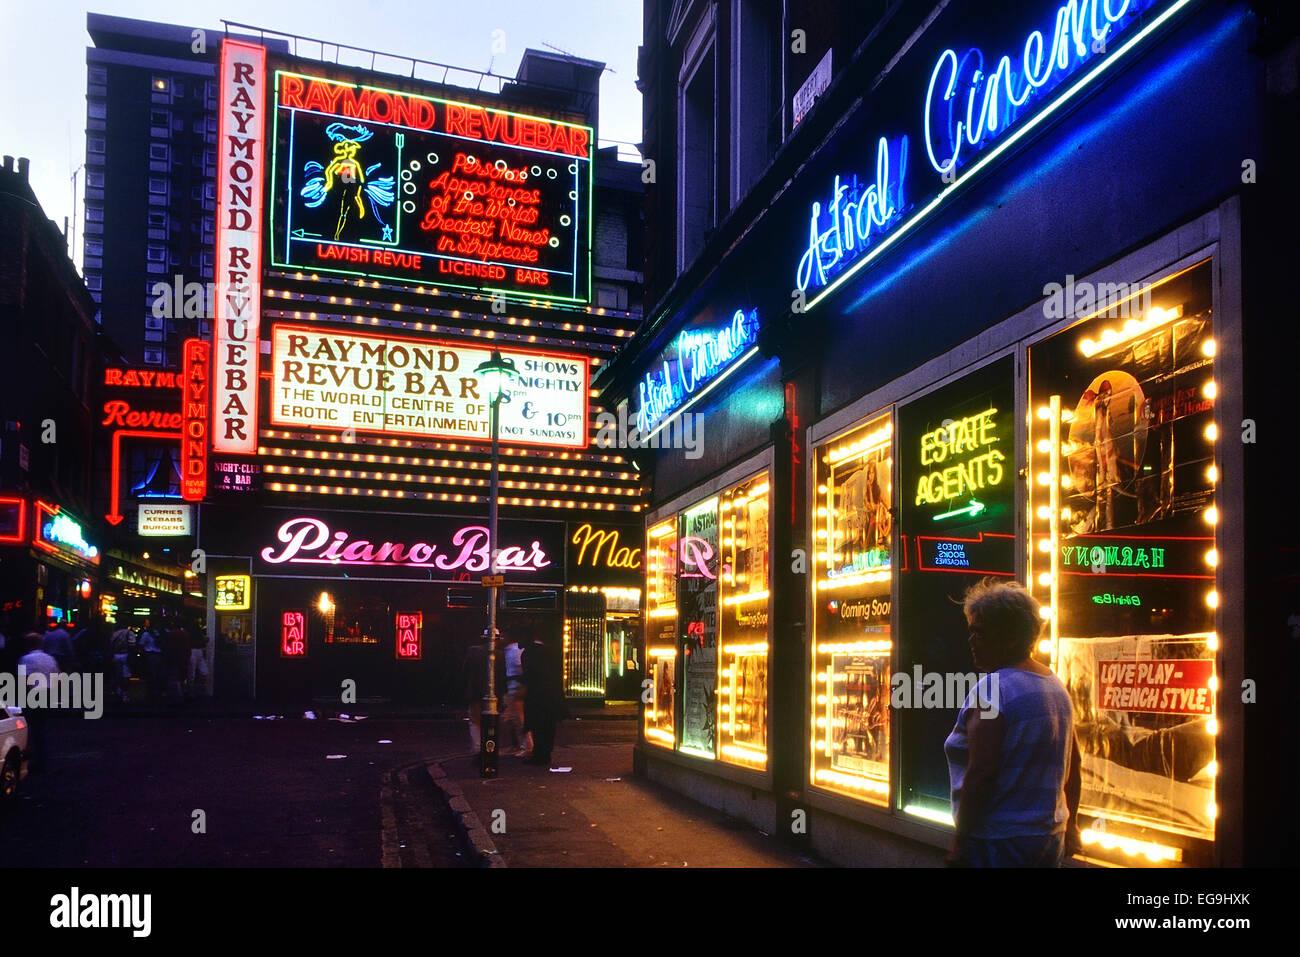 the-raymond-revue-bar-soho-london-englan